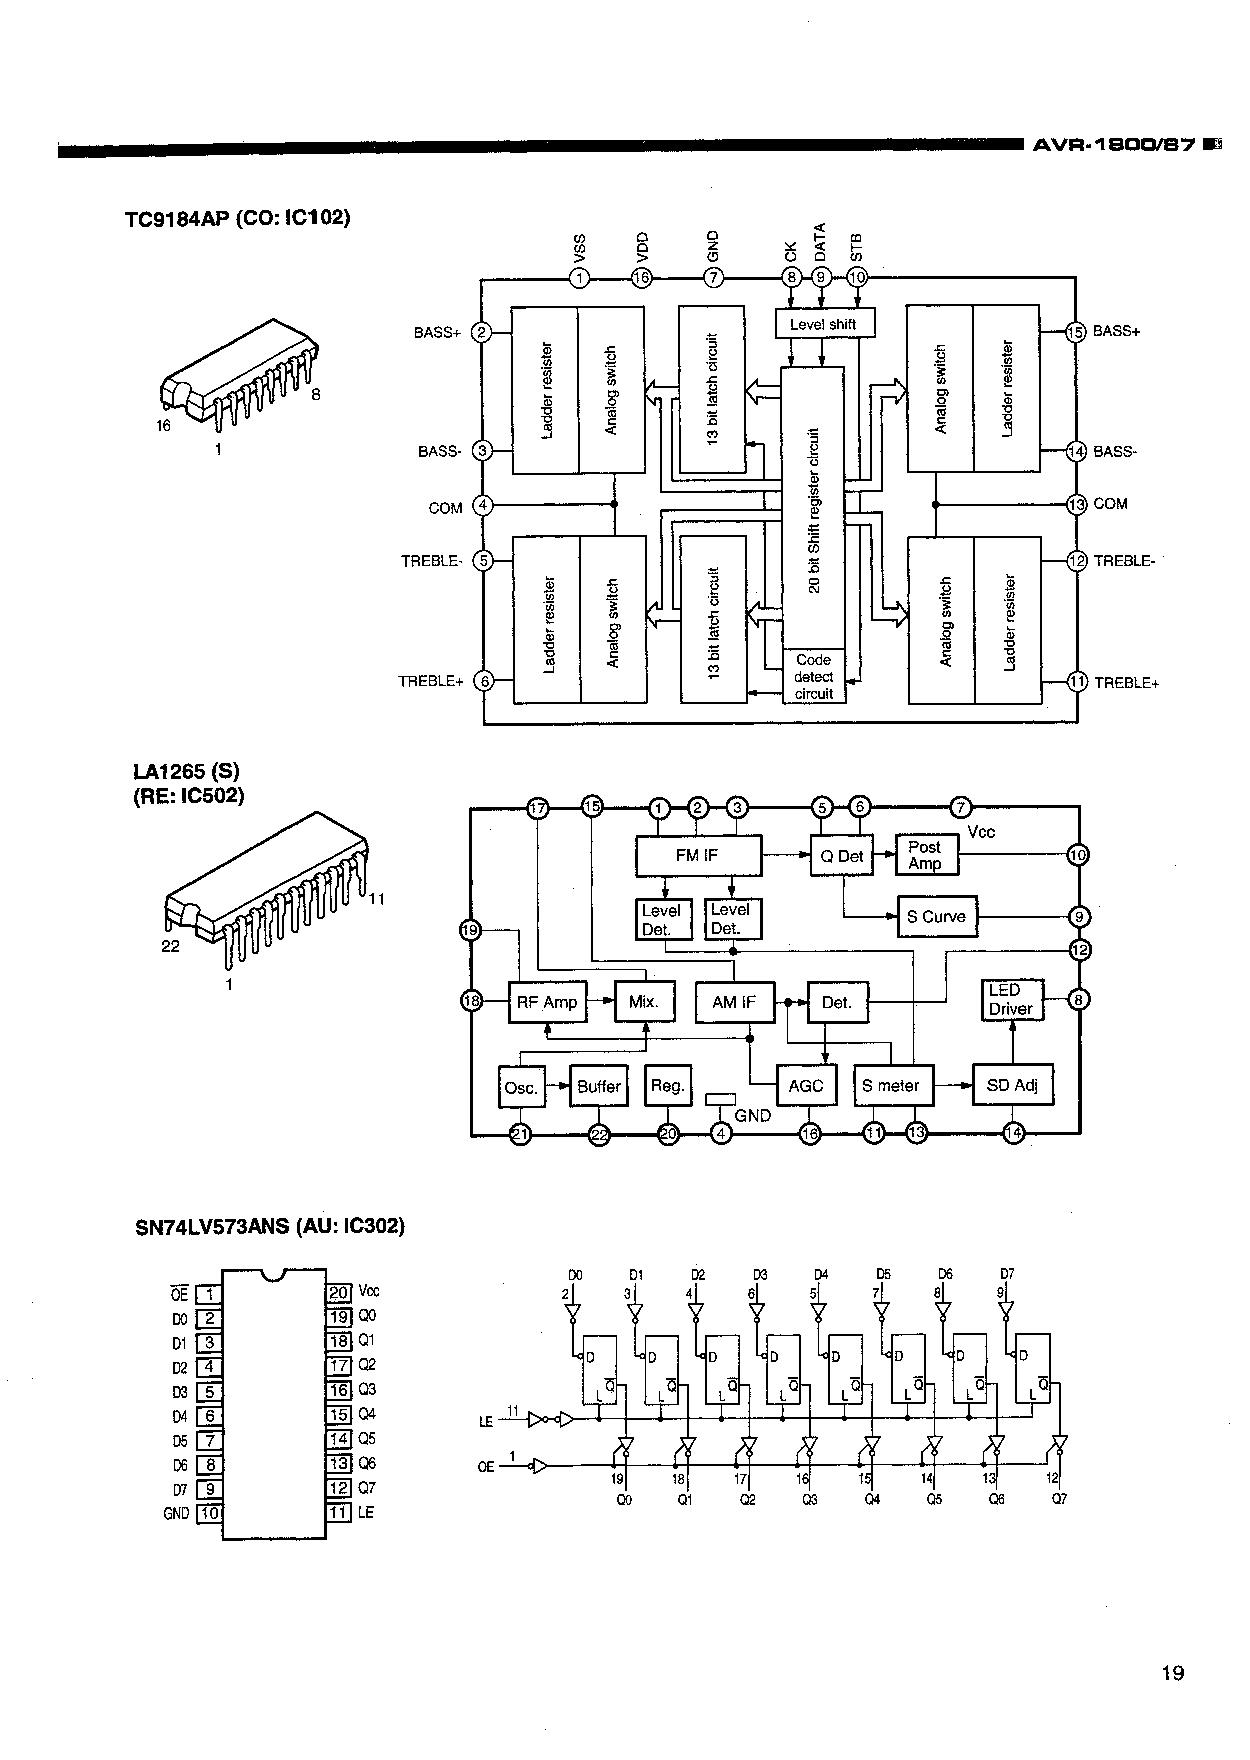 Denon AVR-1800 87 SM Service Manual